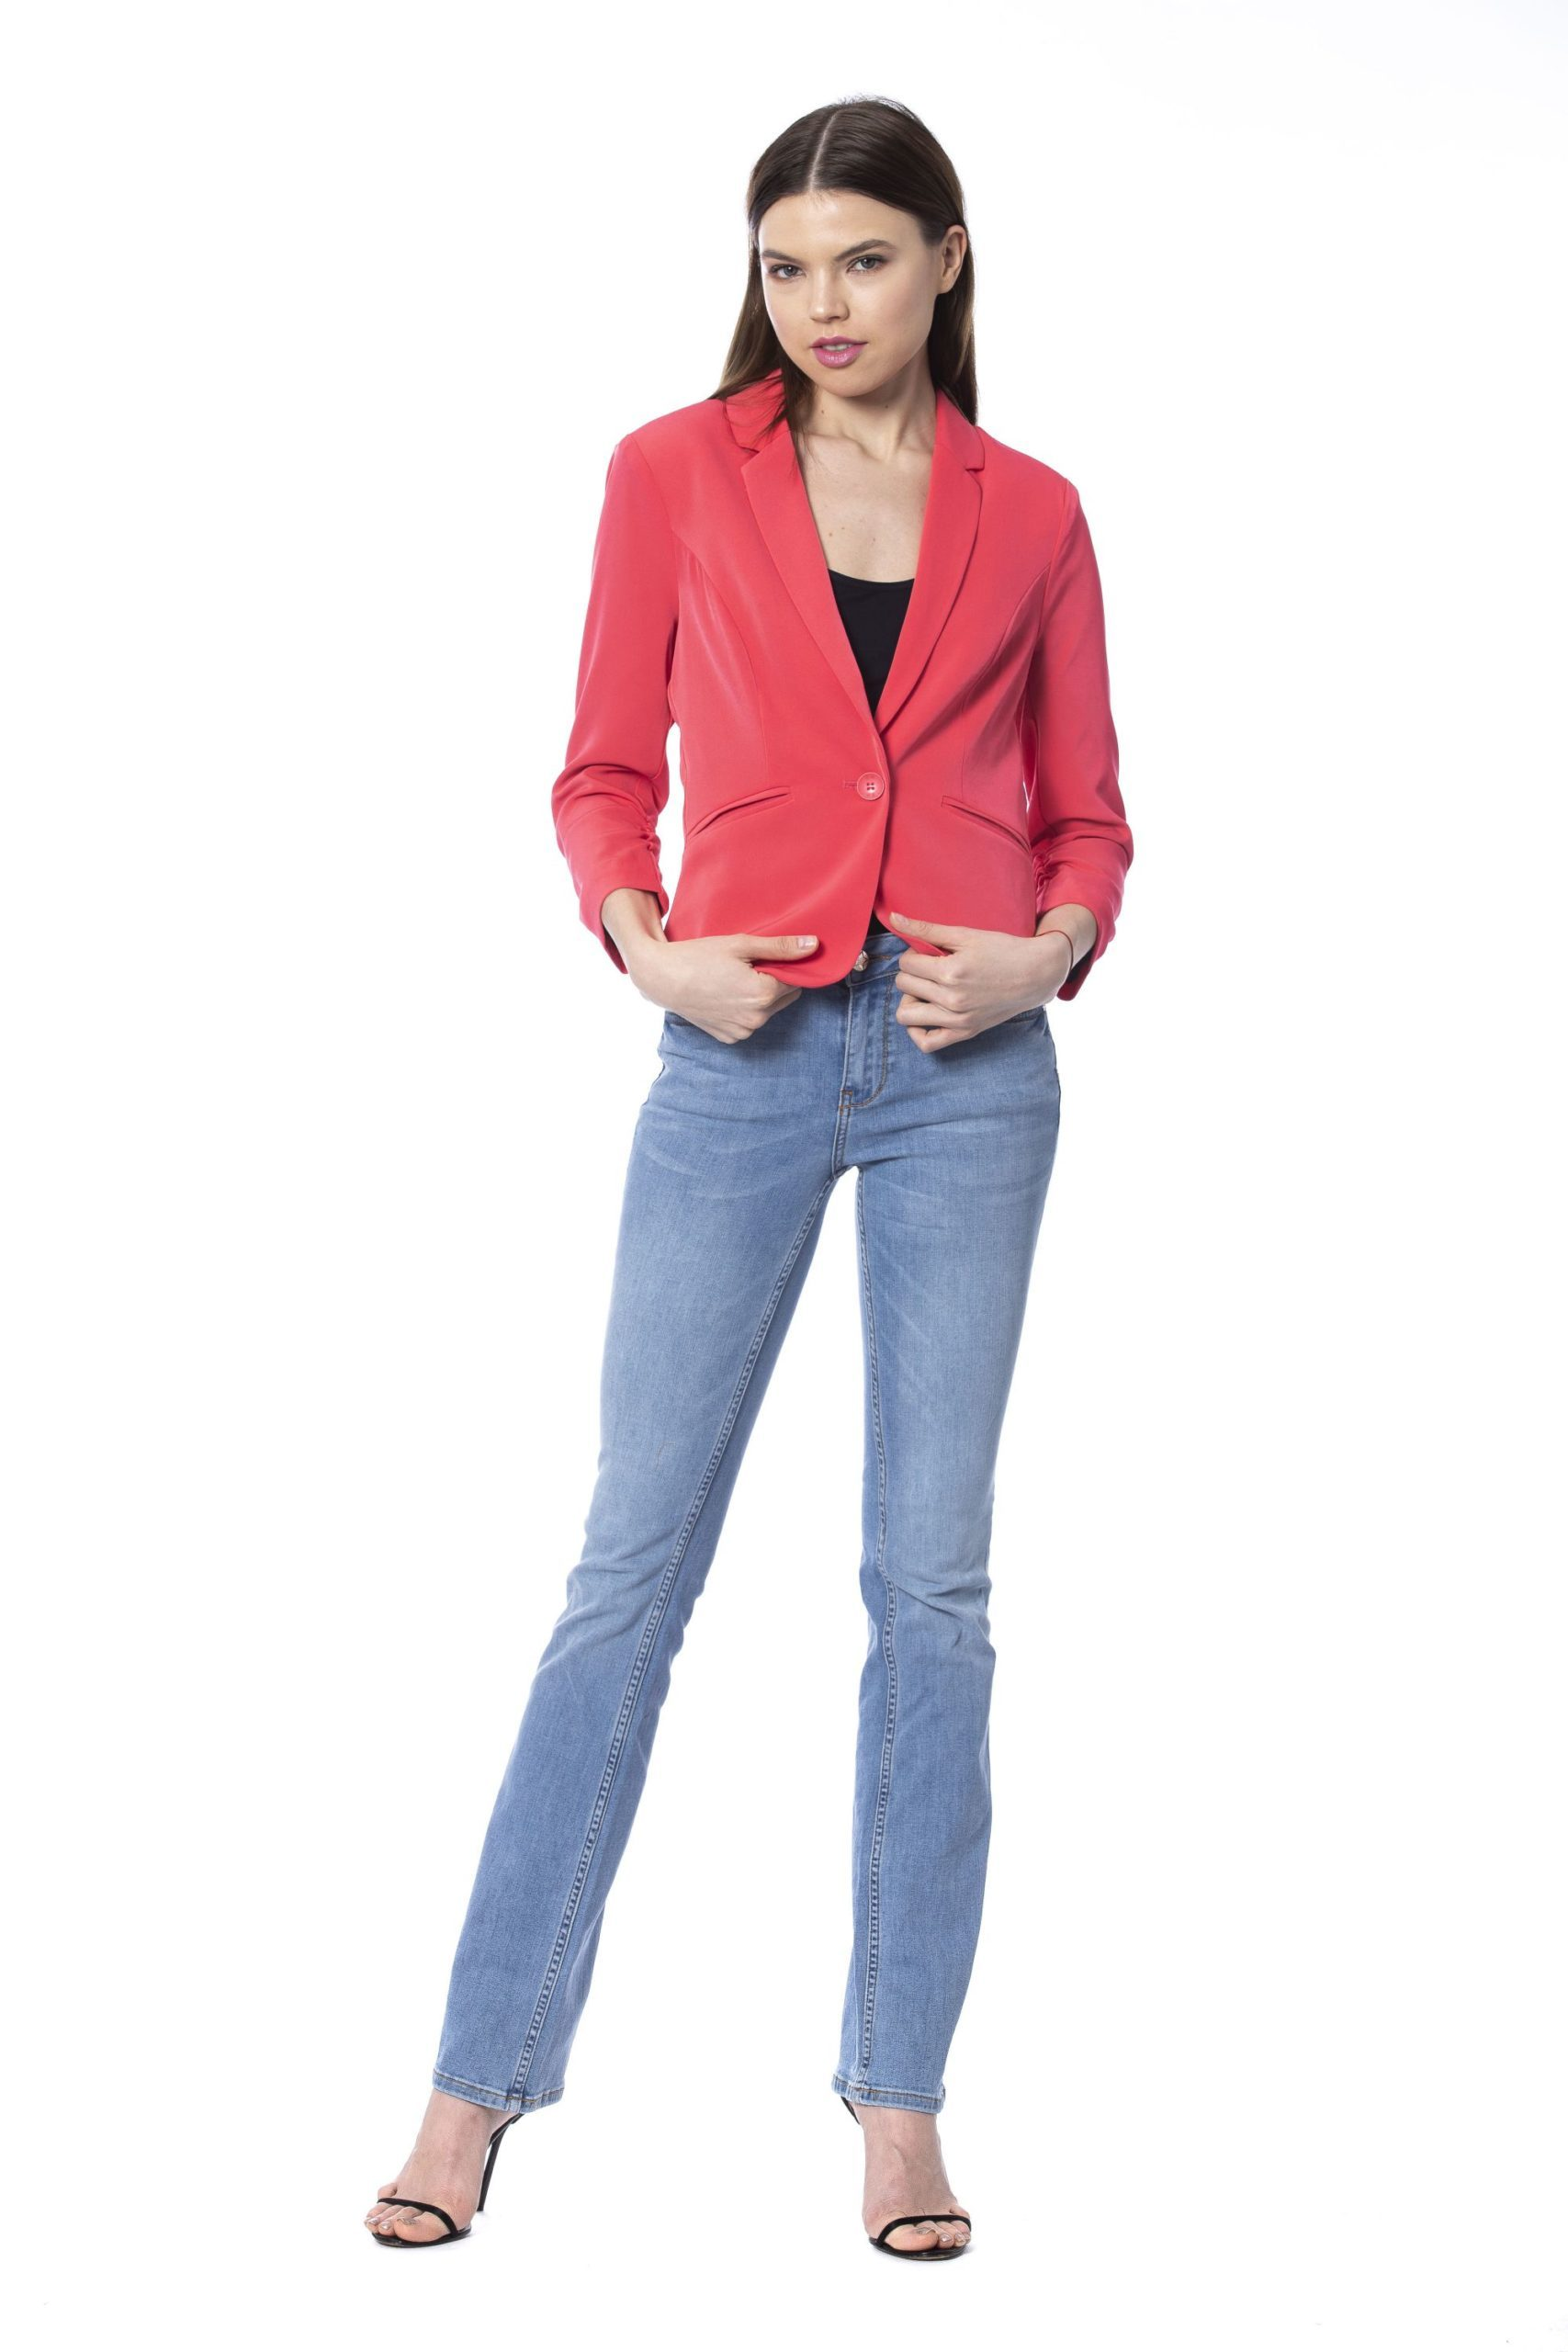 Silvian Heach Women's Formal Jacket Pink SI1264150 - S